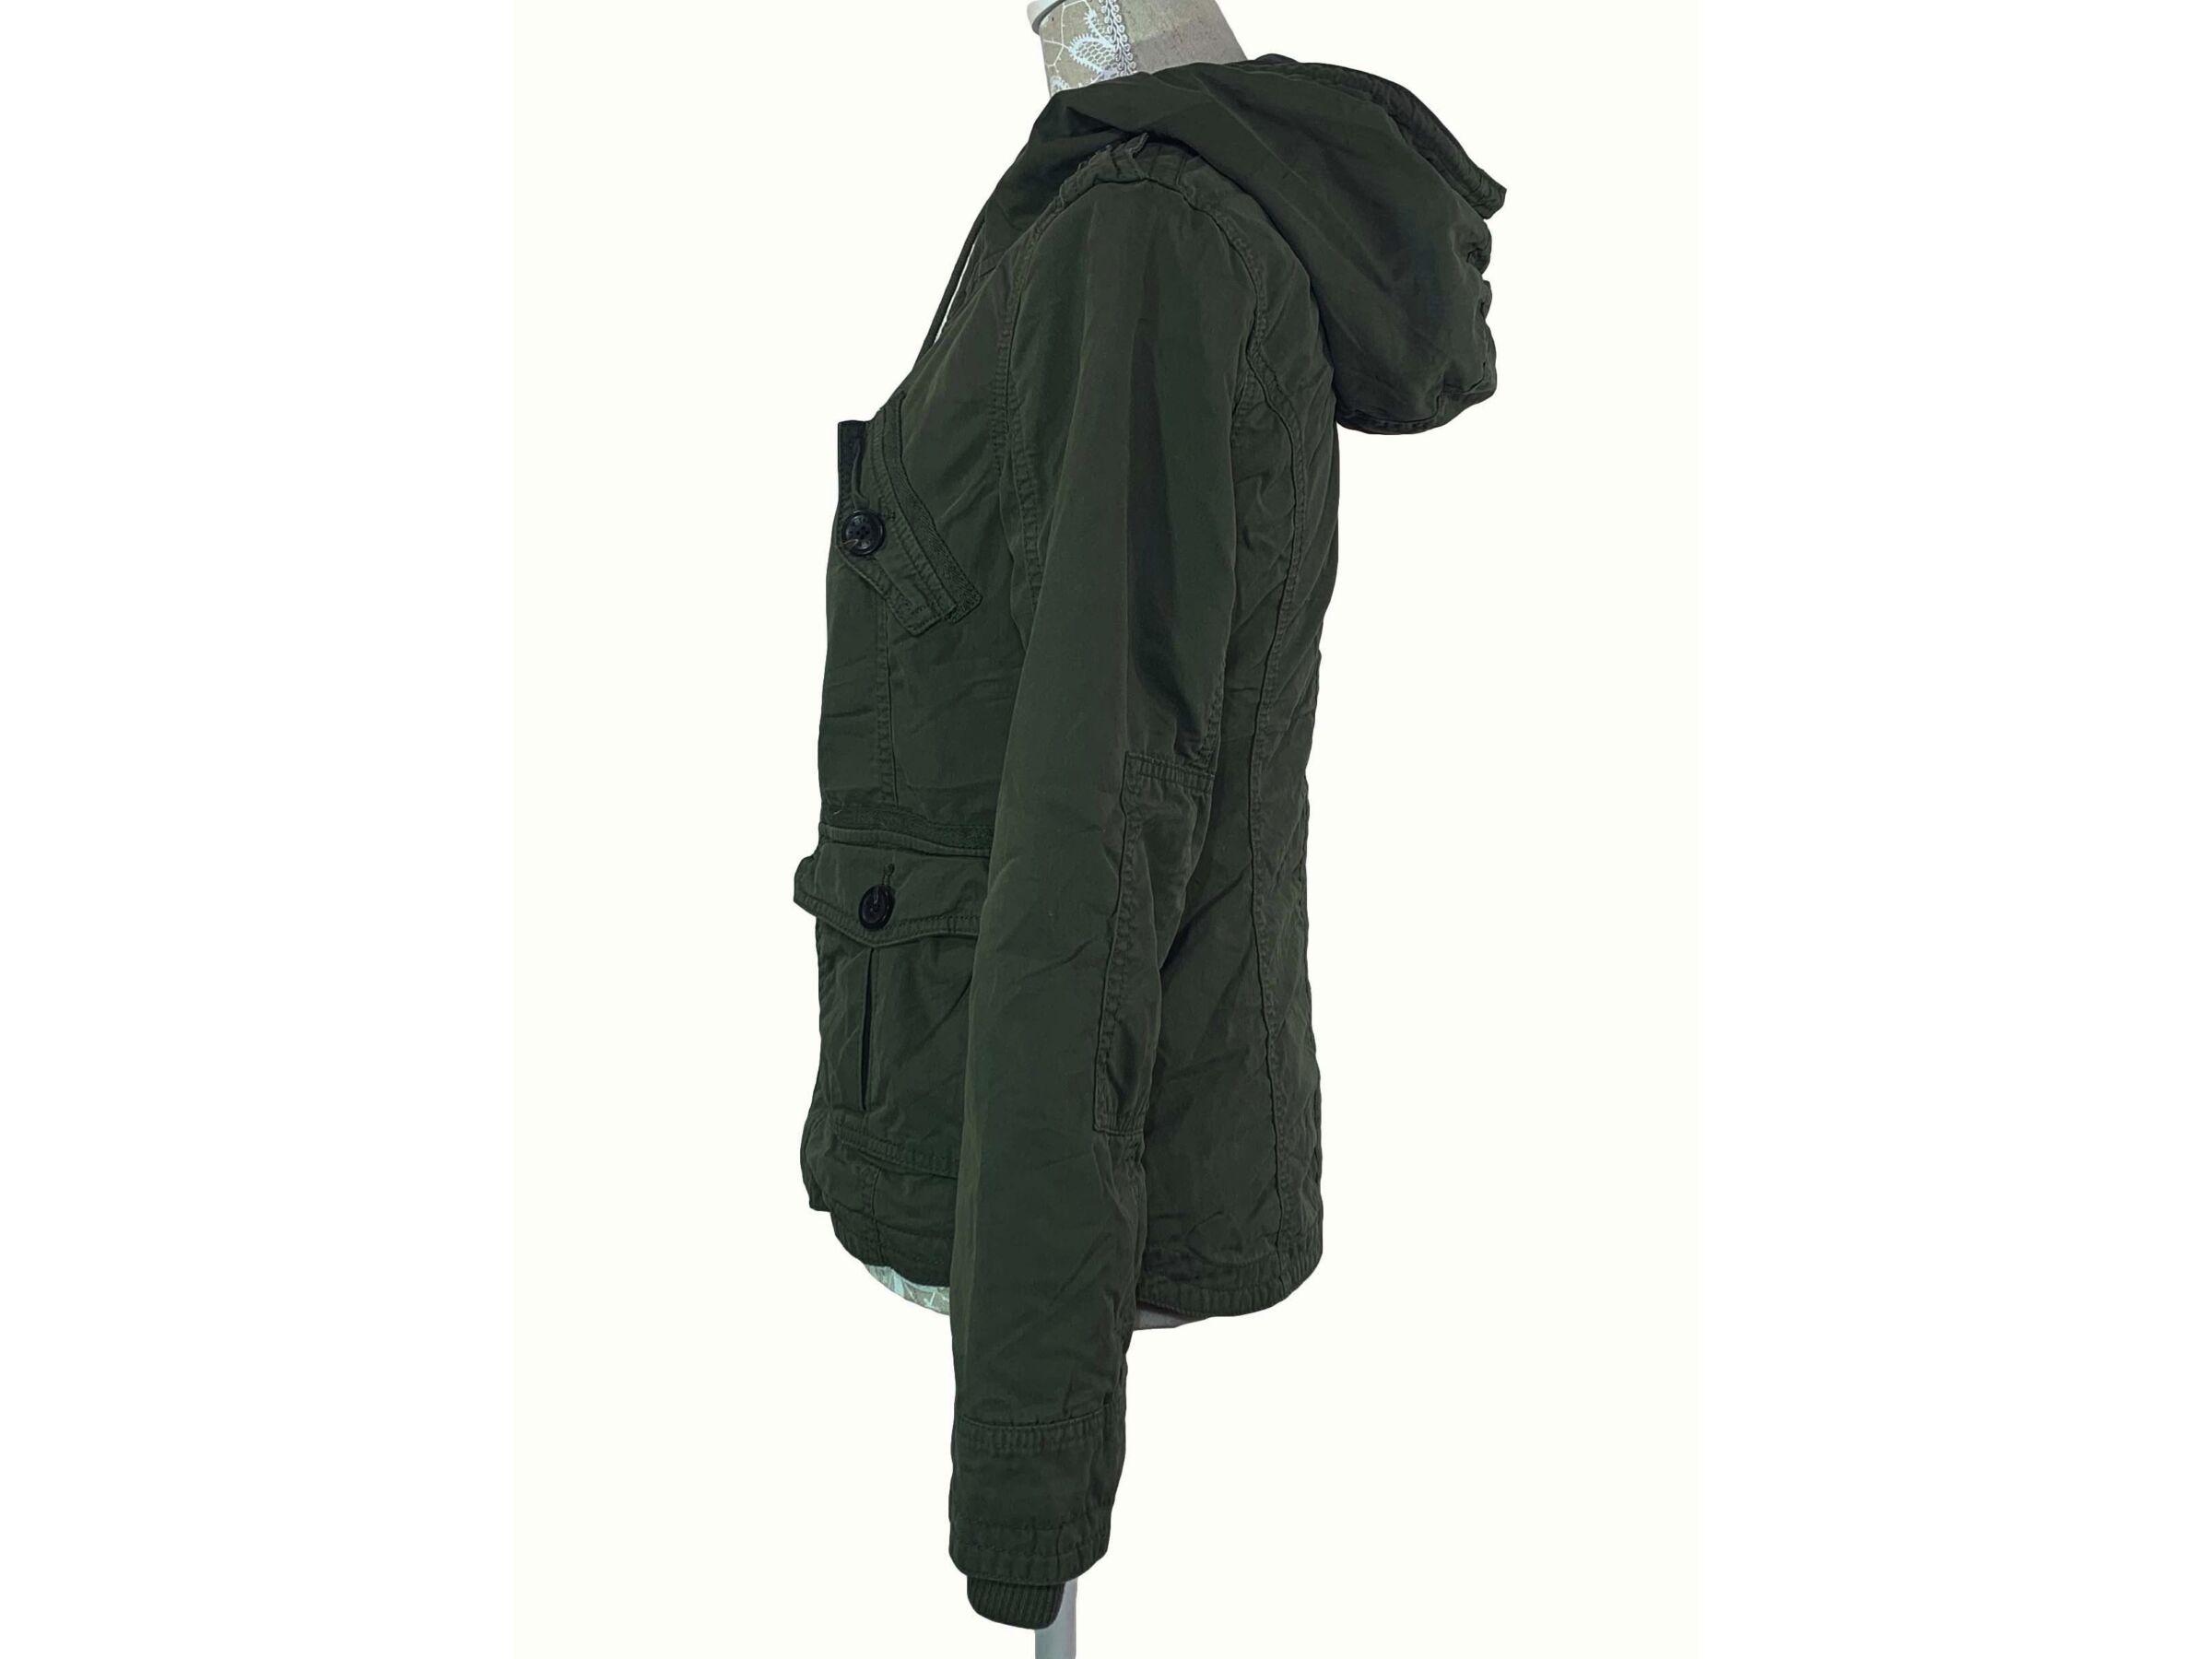 TNA kabát (S)